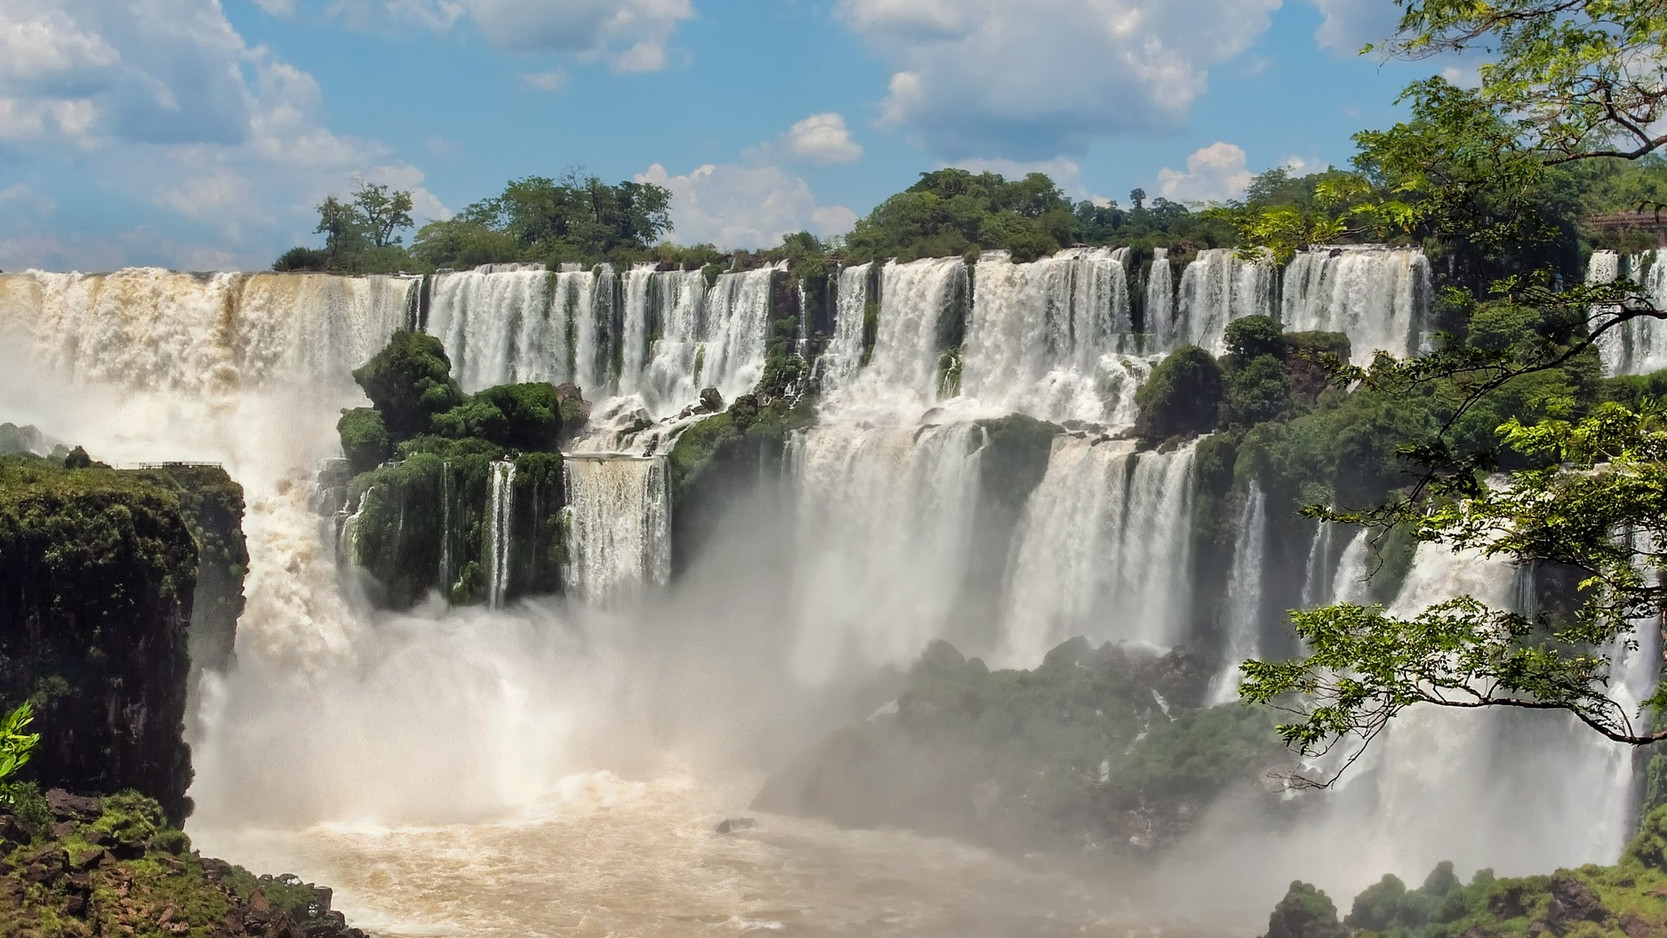 BRAZIL - IGUASSU FALLS